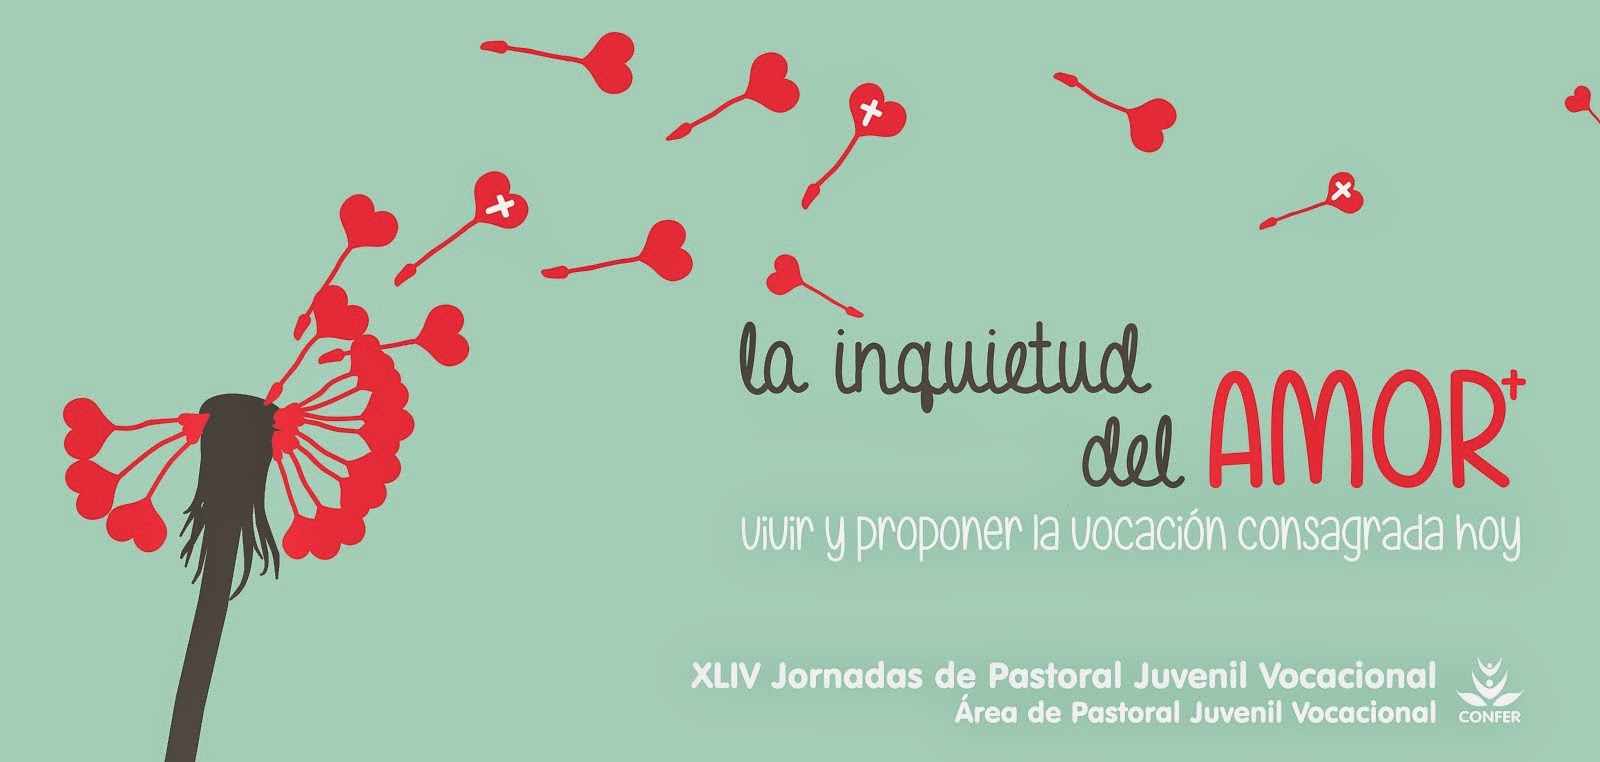 Jornadas de Pastoral Juvenil Vocacional de CONFER (10-12 de Octubre de 2014)